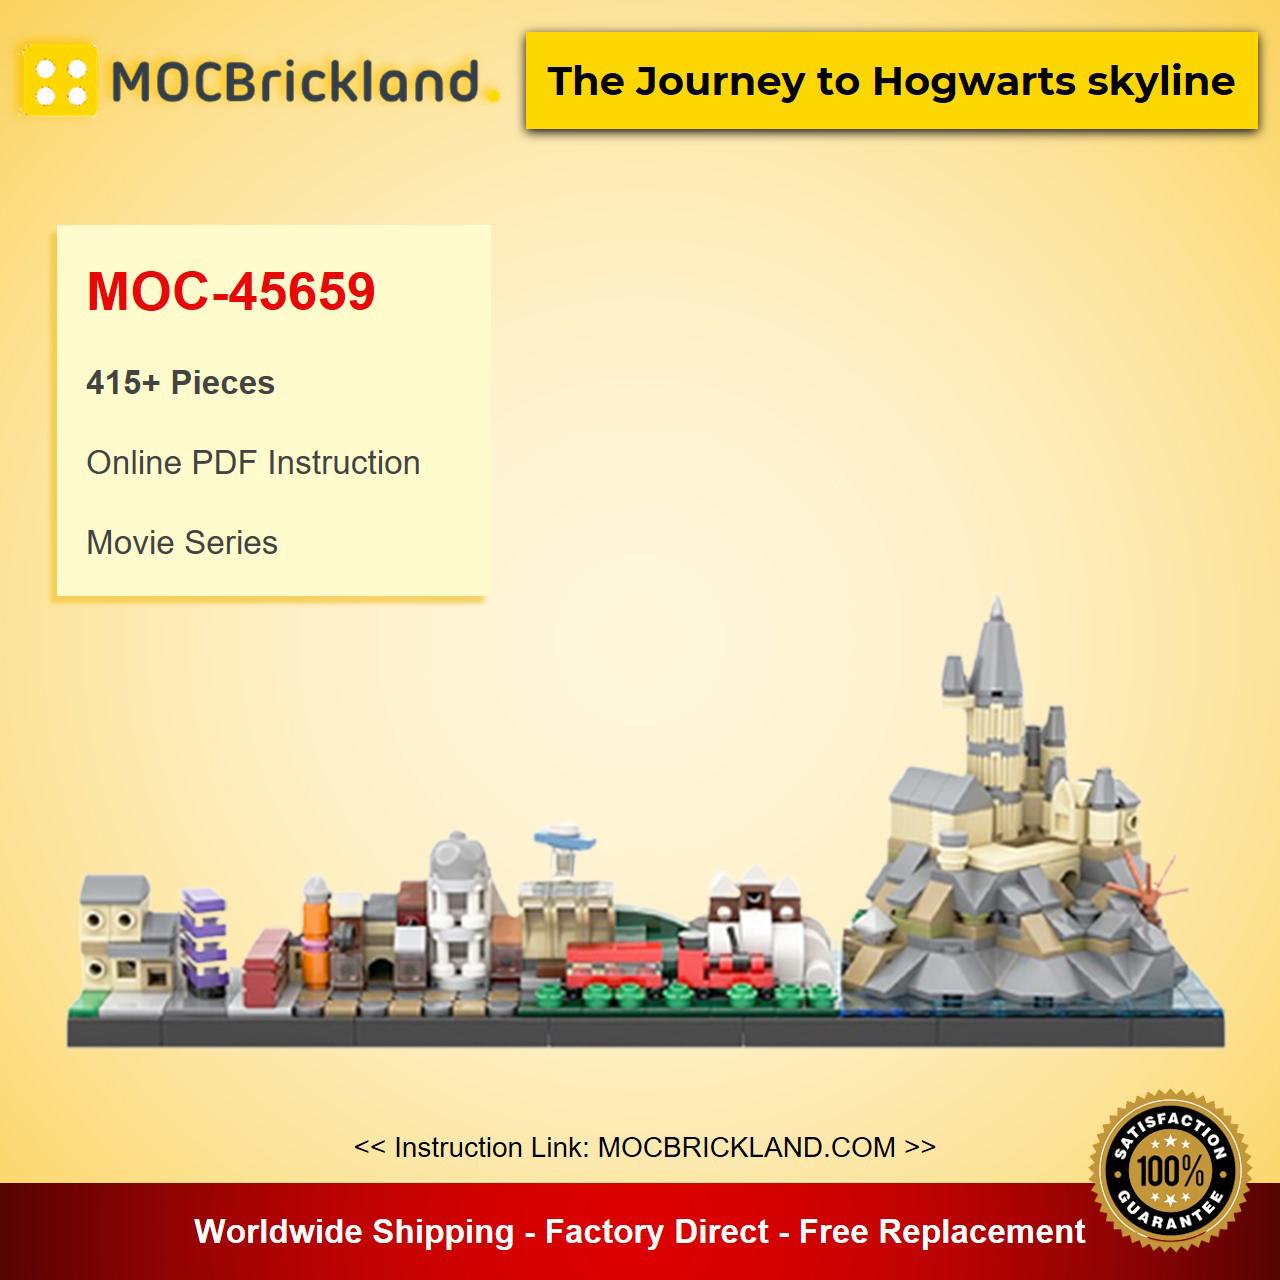 The Journey to Hօgwarts skyline MOC-45659 Movie Designed By benbuildslego With 415 Pieces